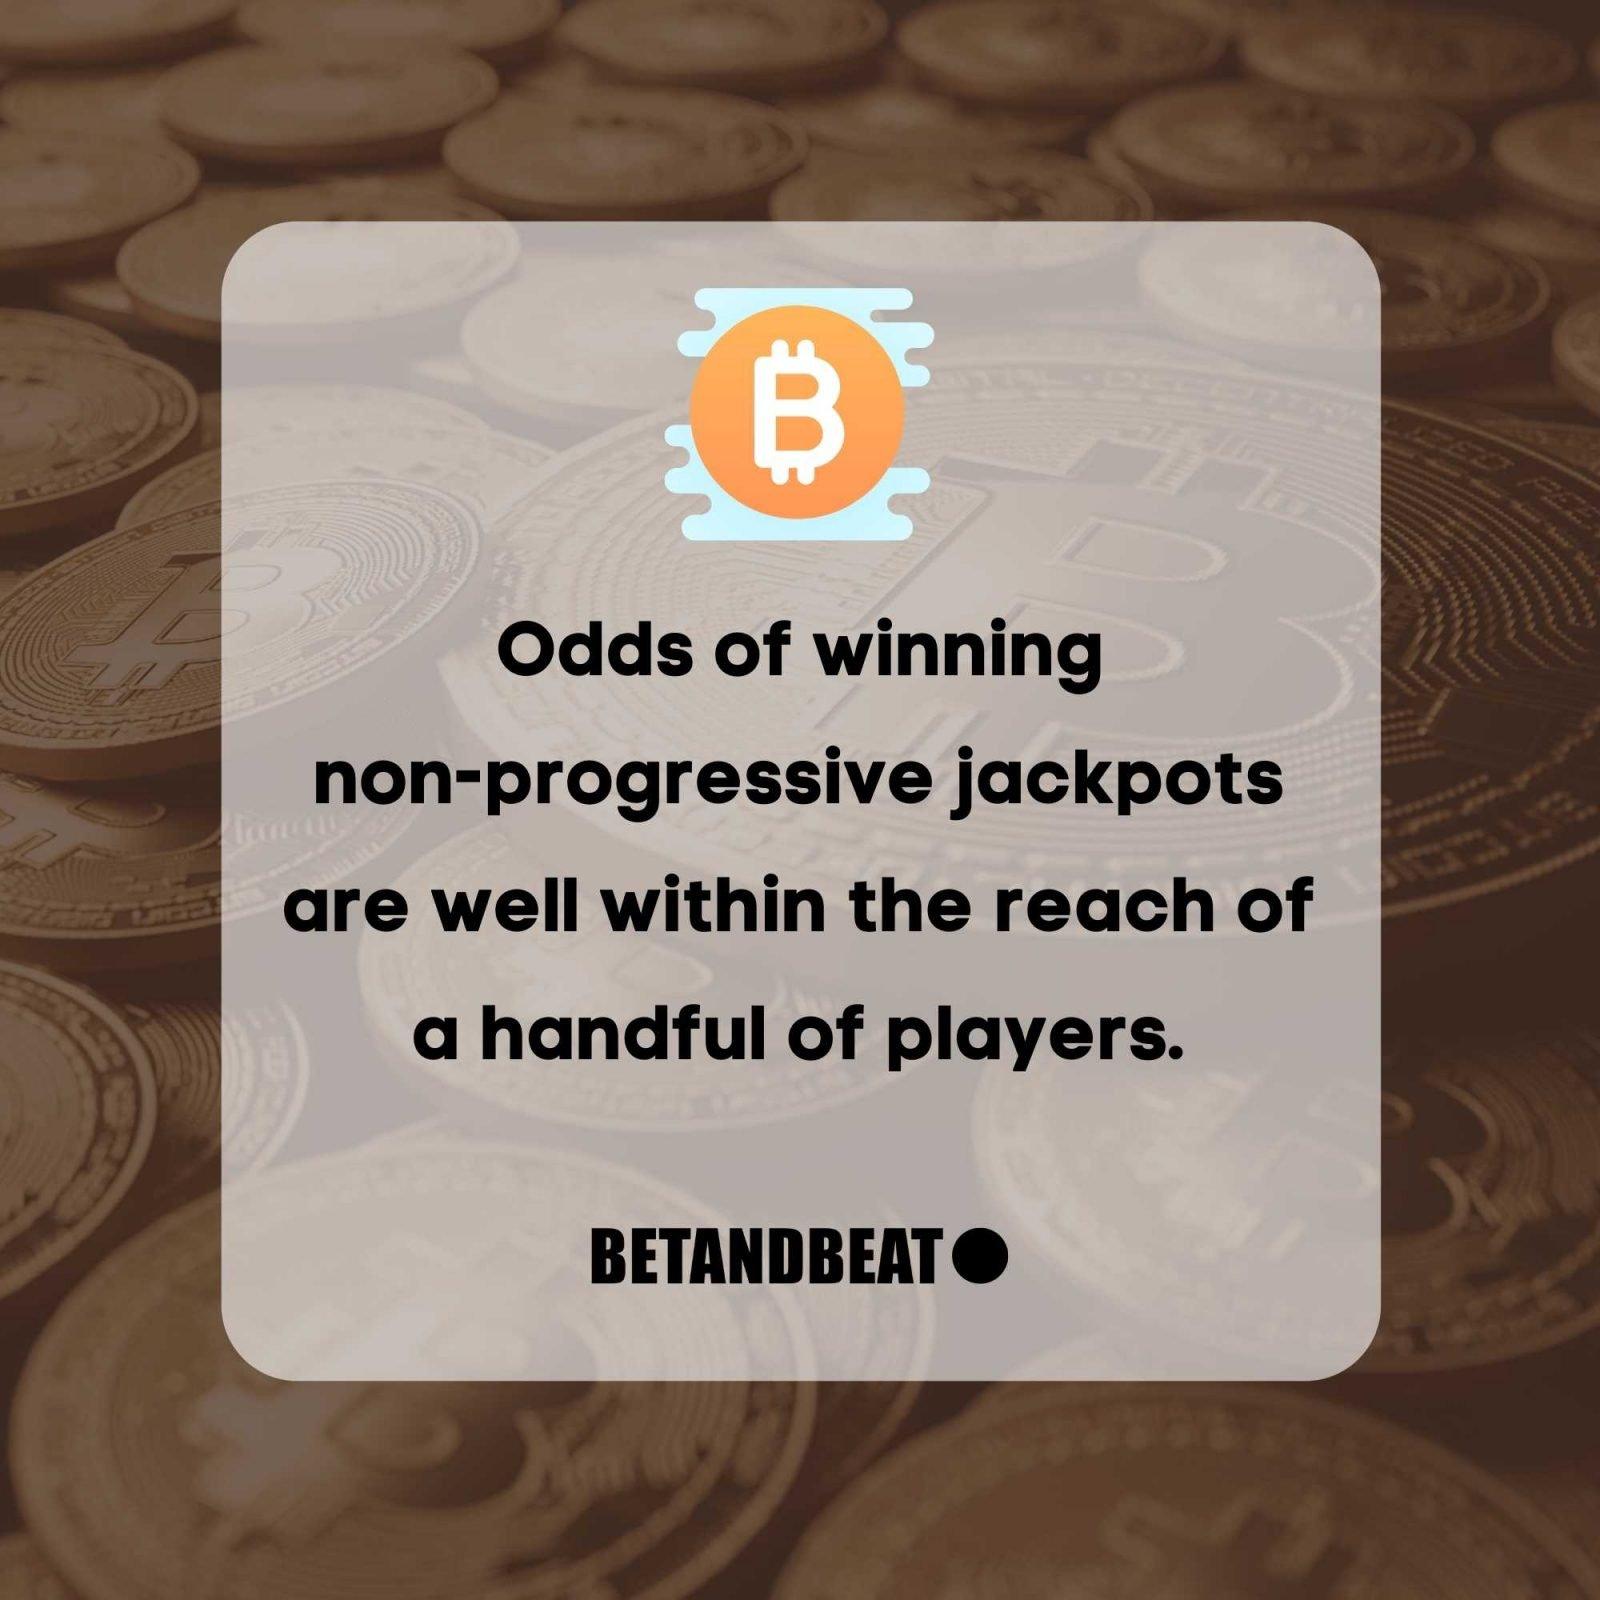 jackpot odds in bitcoin casinos